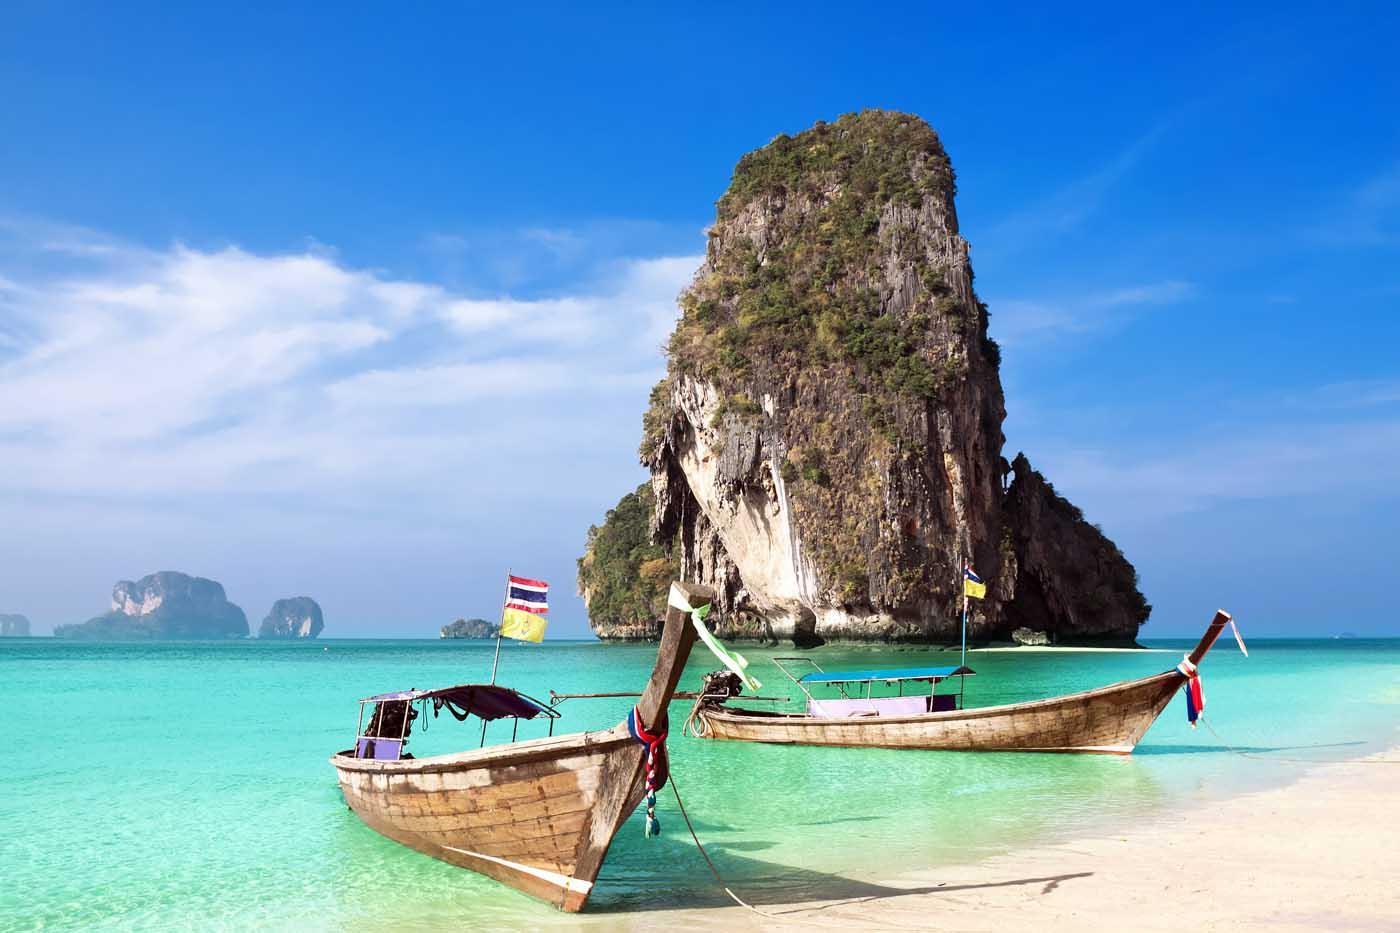 Krabi Travel Cost Average Price Of A Vacation To Krabi